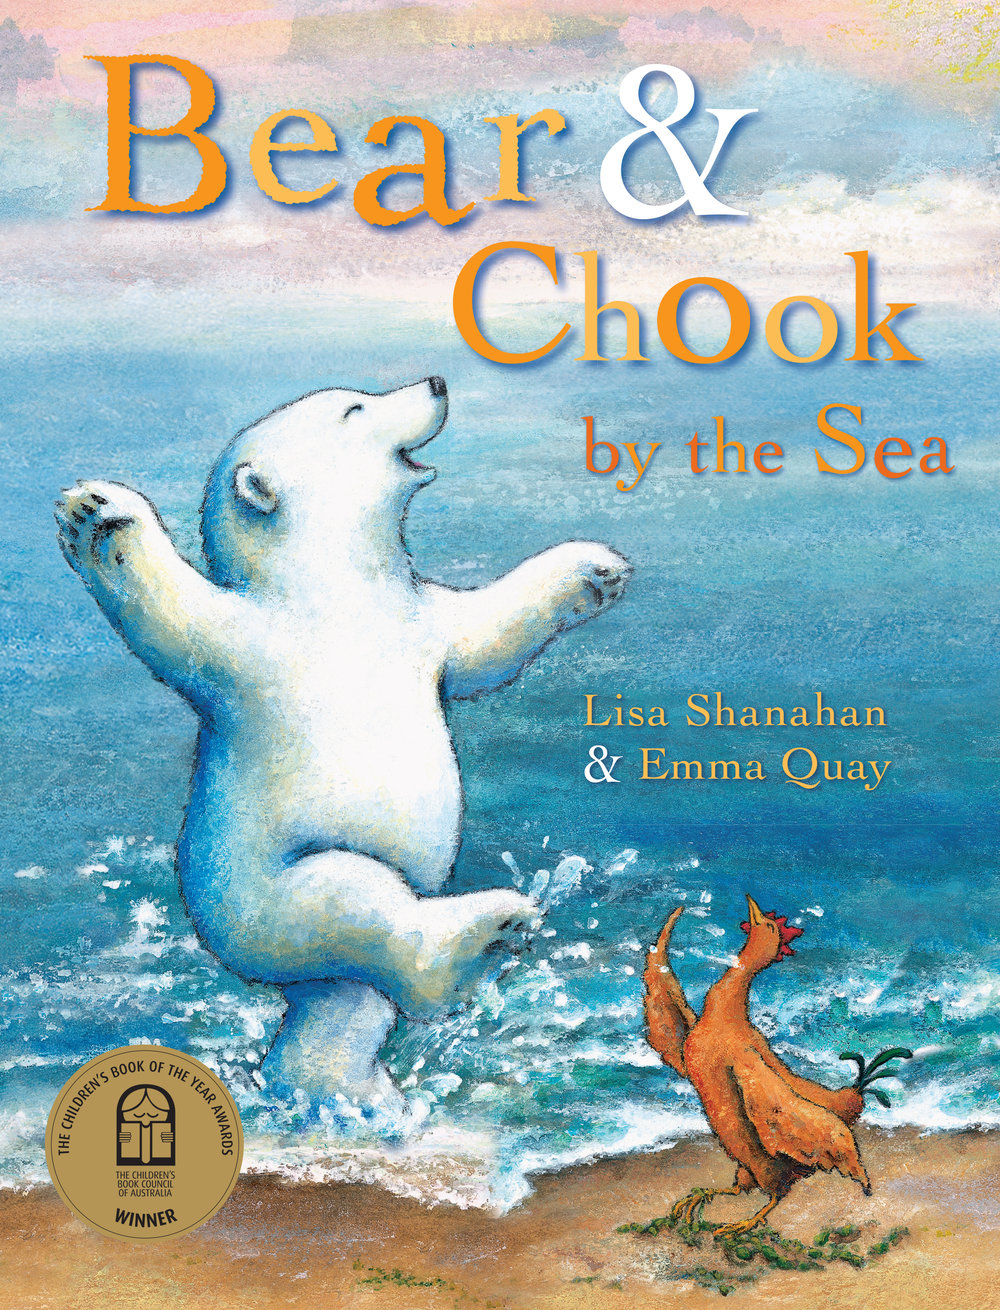 BEAR AND CHOOK BY THE SEA by Lisa Shanahan and Emma Quay (Lothian Books) - www.emmaquay.com